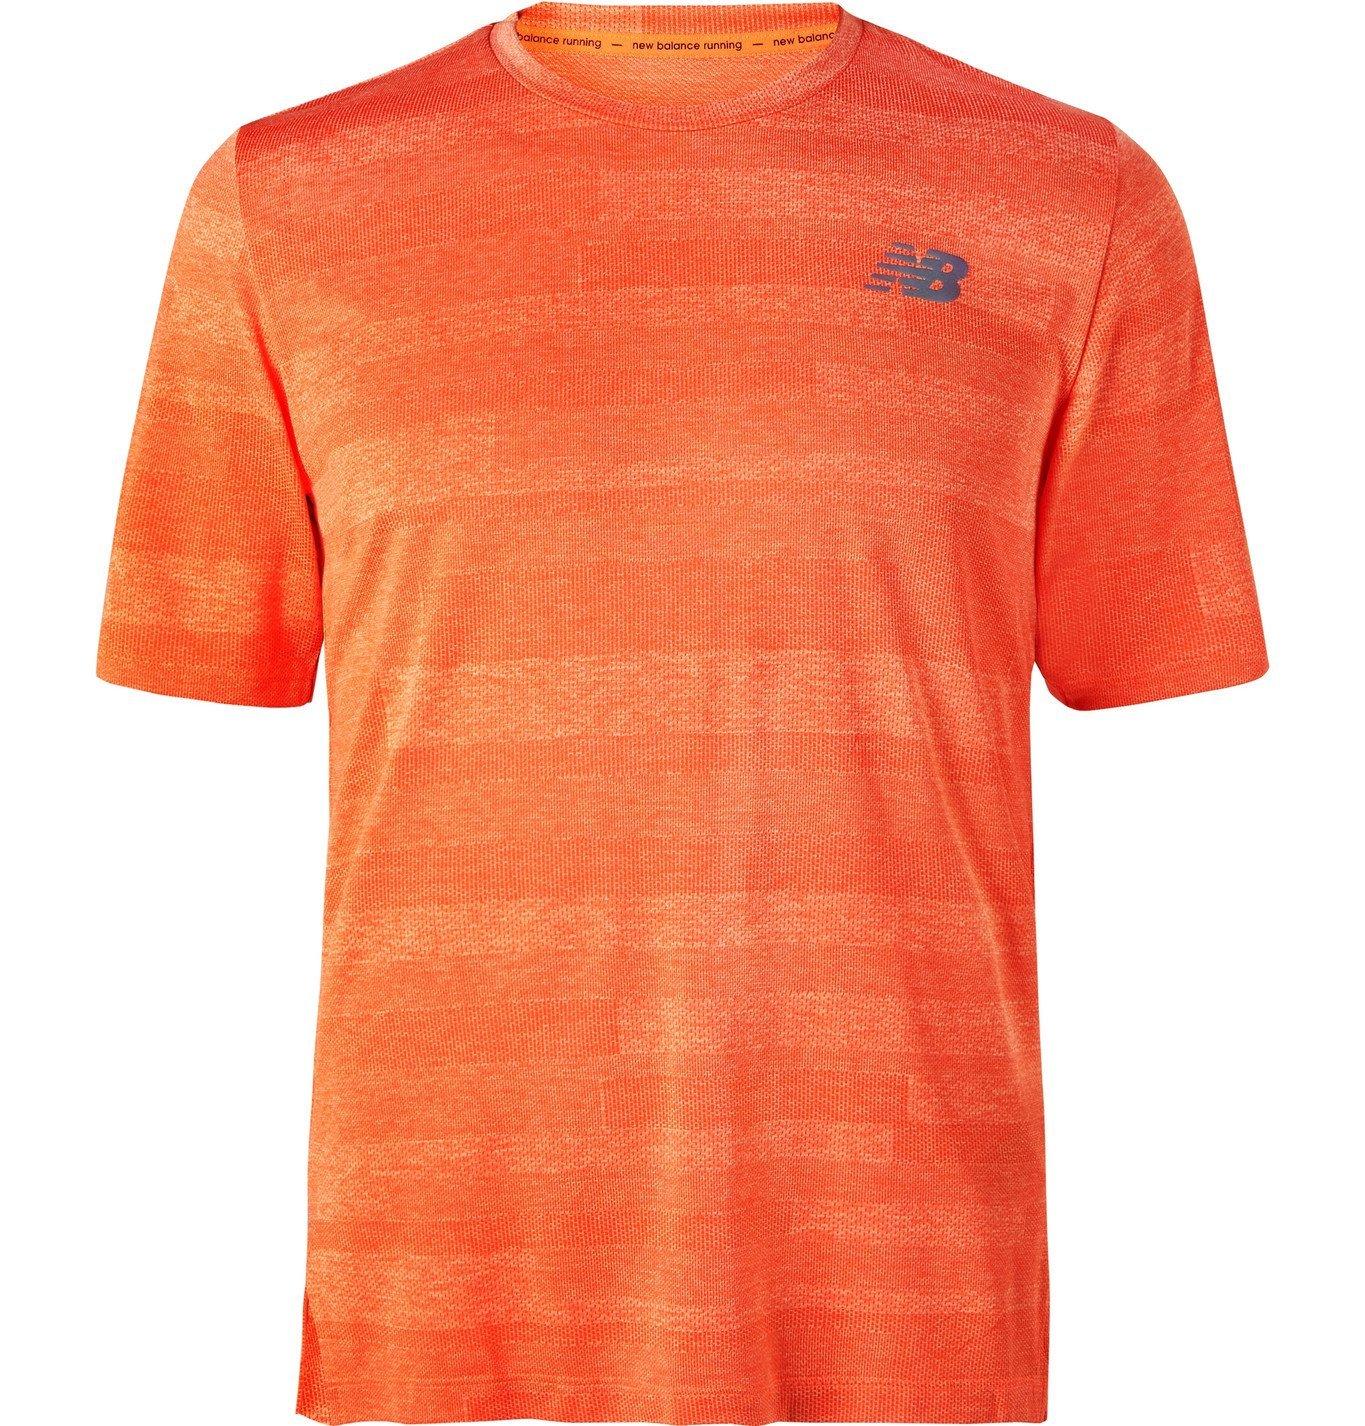 new balance running tshirt